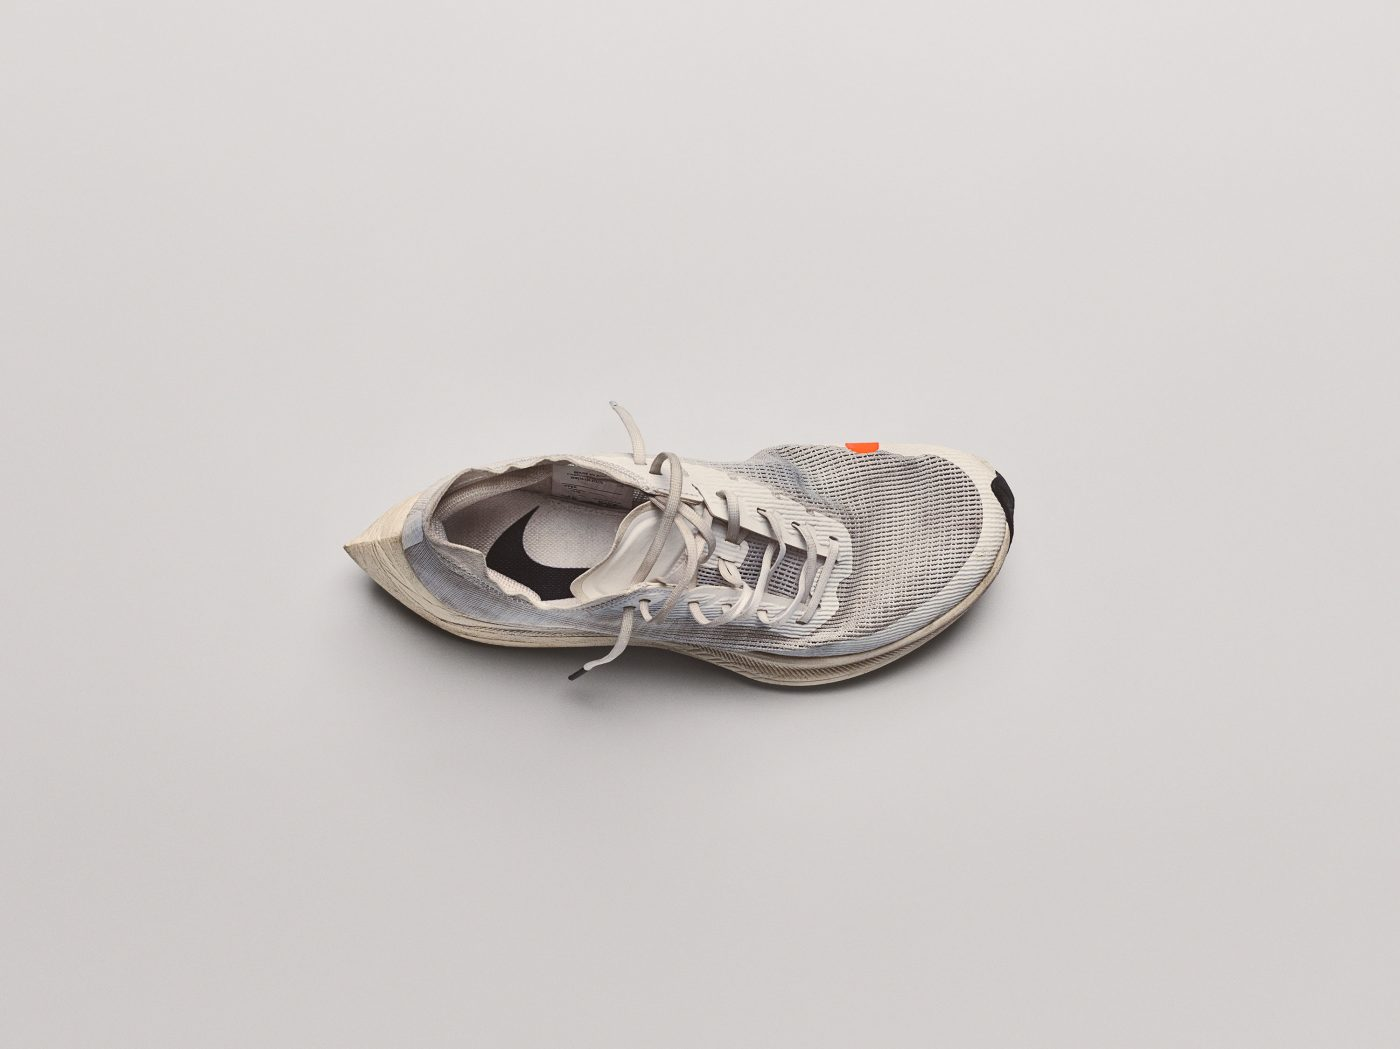 Nike_ZoomX_Vaporfly_NEXT%_7